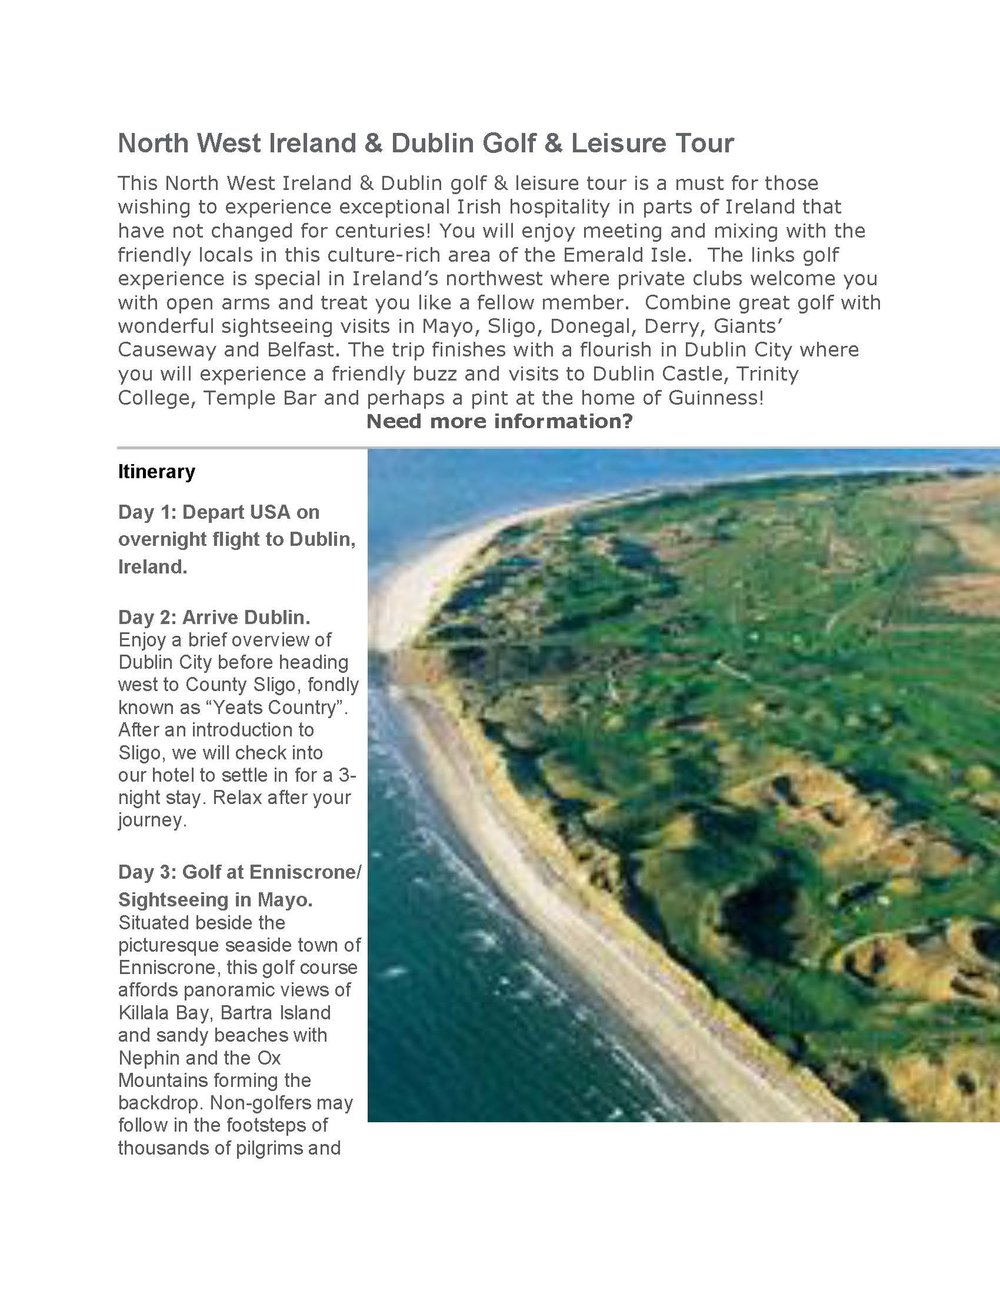 North West Ireland & Dublin Golf & Leisure Tour Edited_Page_1.jpg